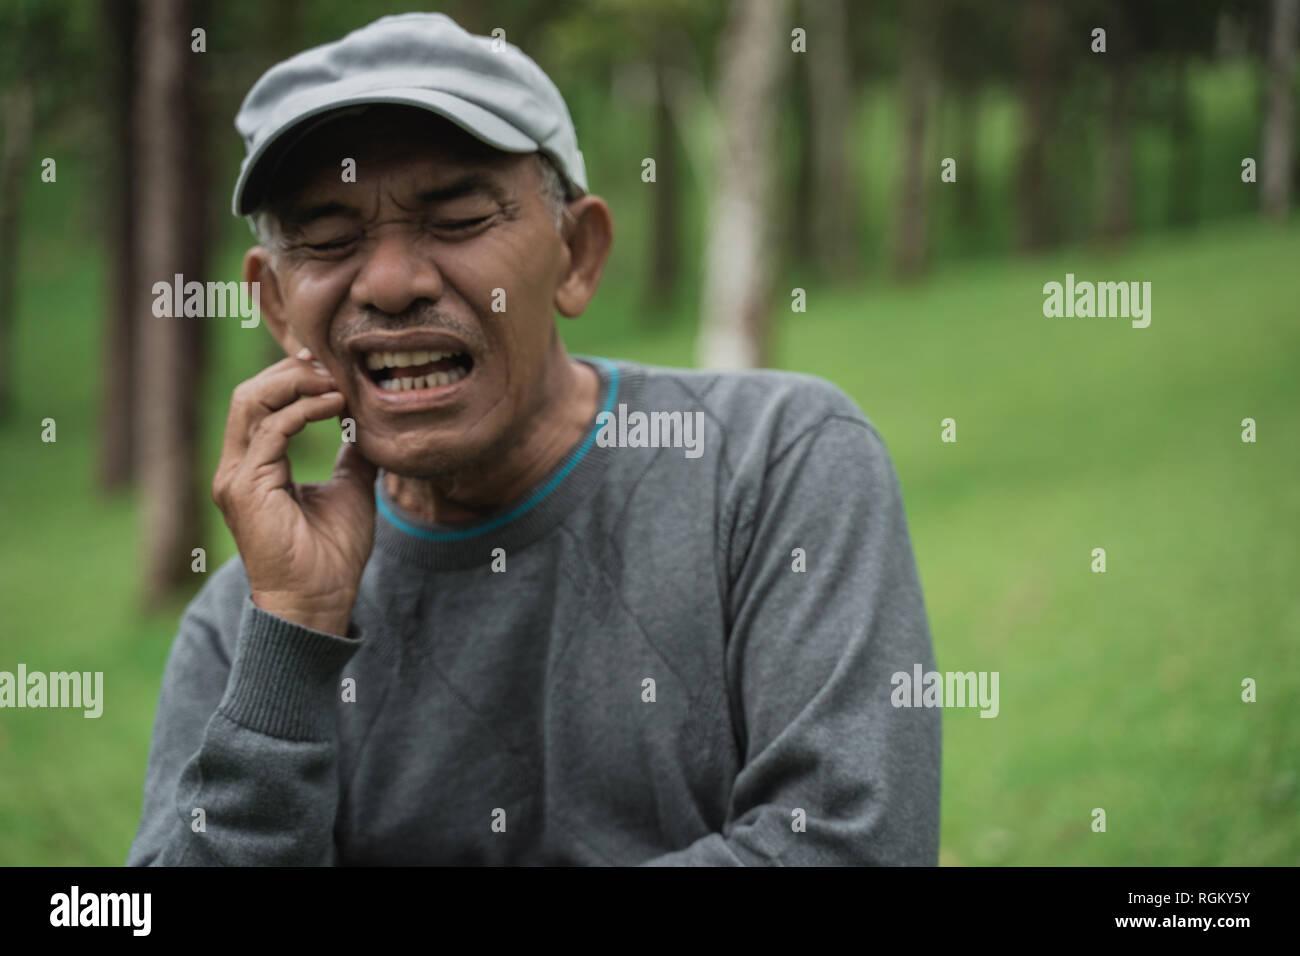 senior asian male having toothache - Stock Image